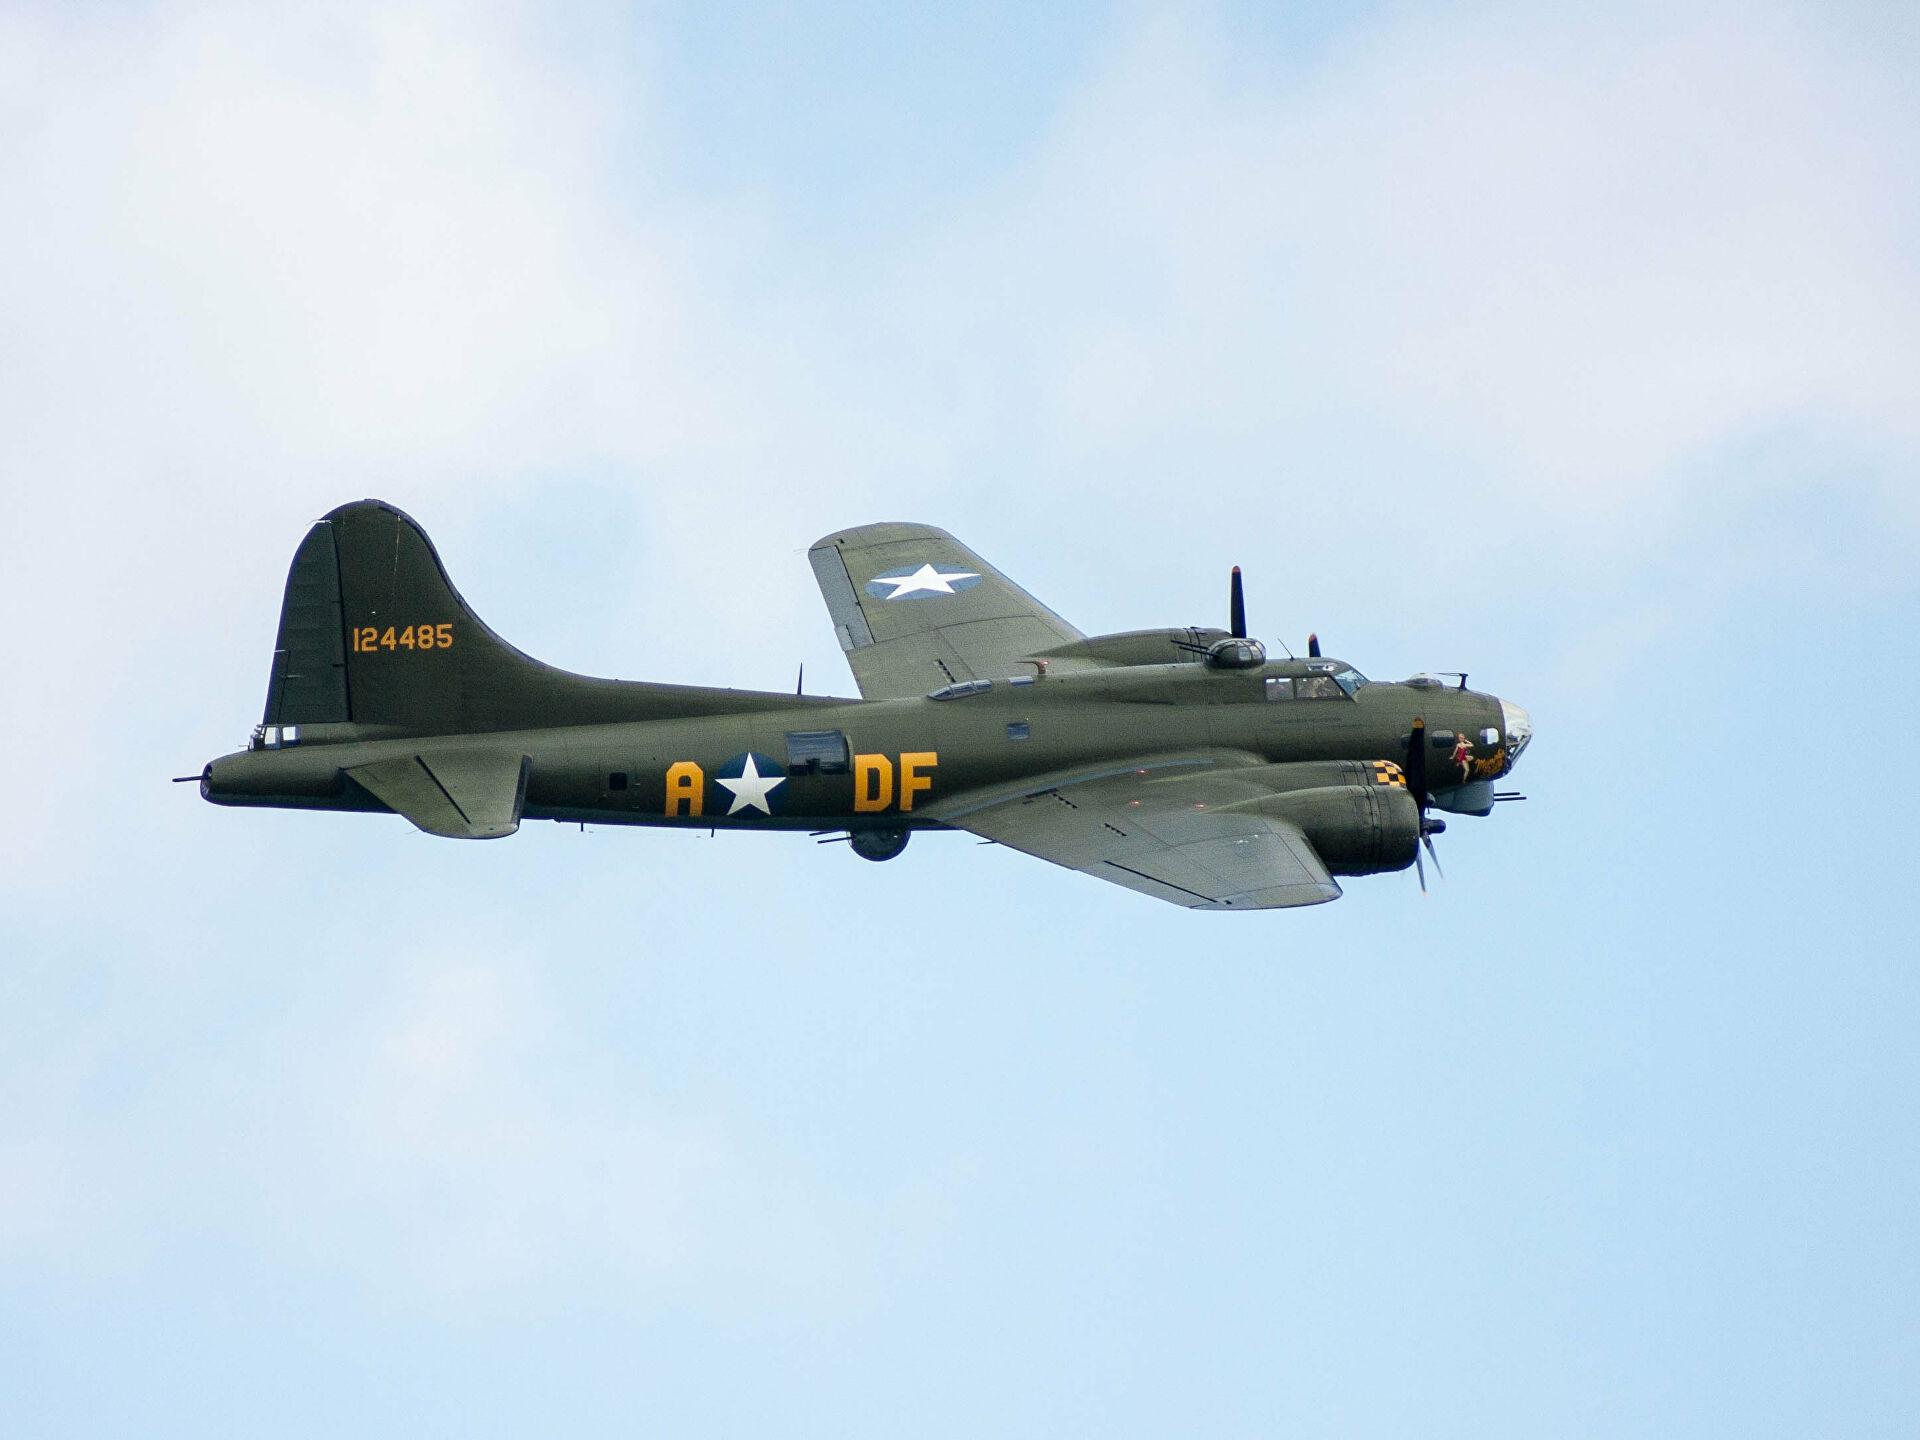 б 17 самолет